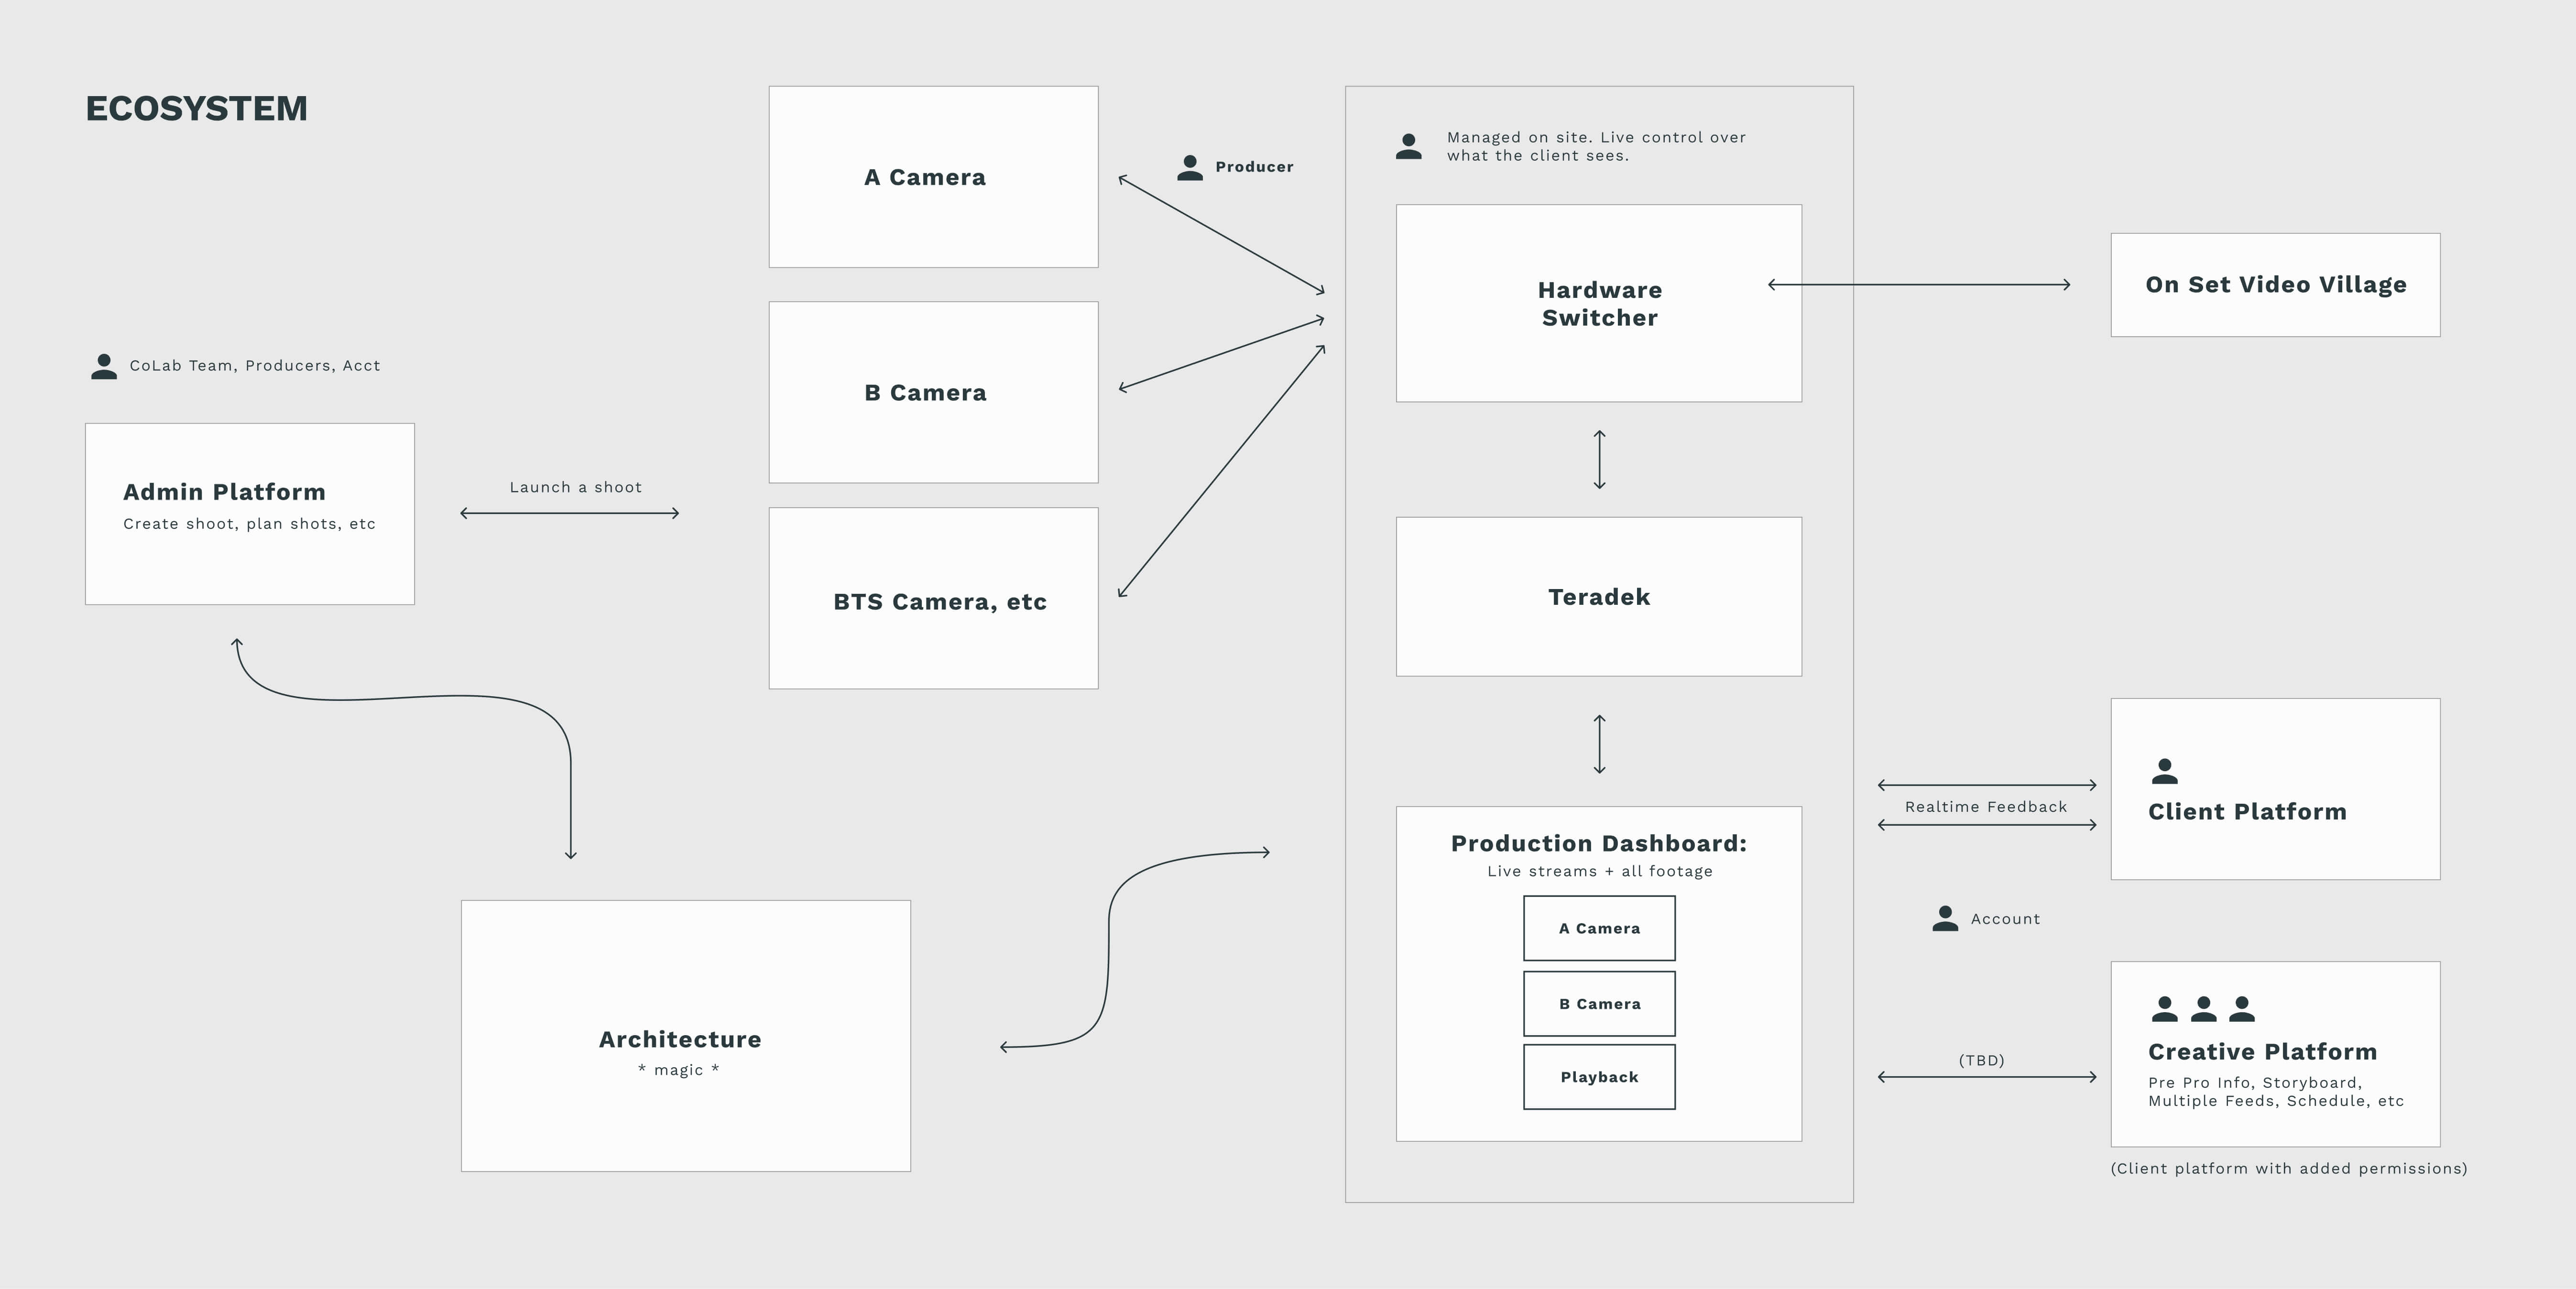 An illustration of the tech ecosystem behind the V3 platform